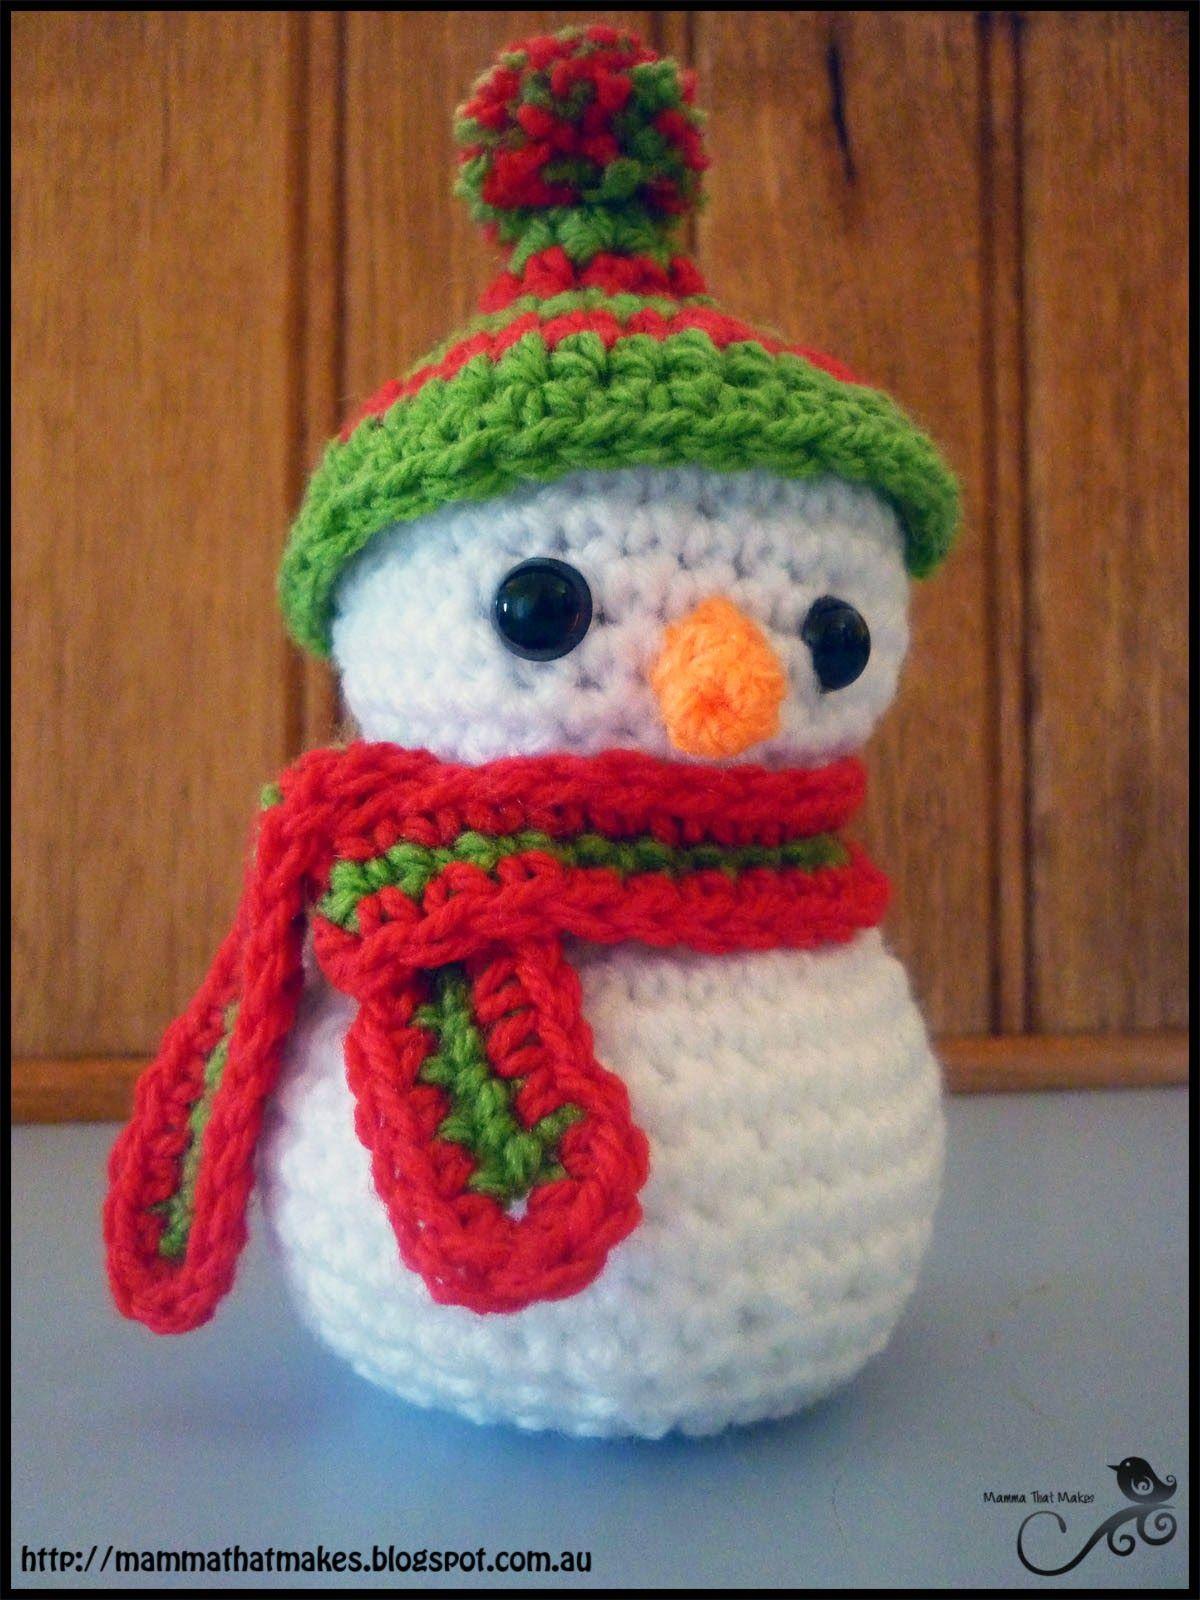 Mamma That Makes: George The Snowman | Crochet Patterns | Pinterest ...